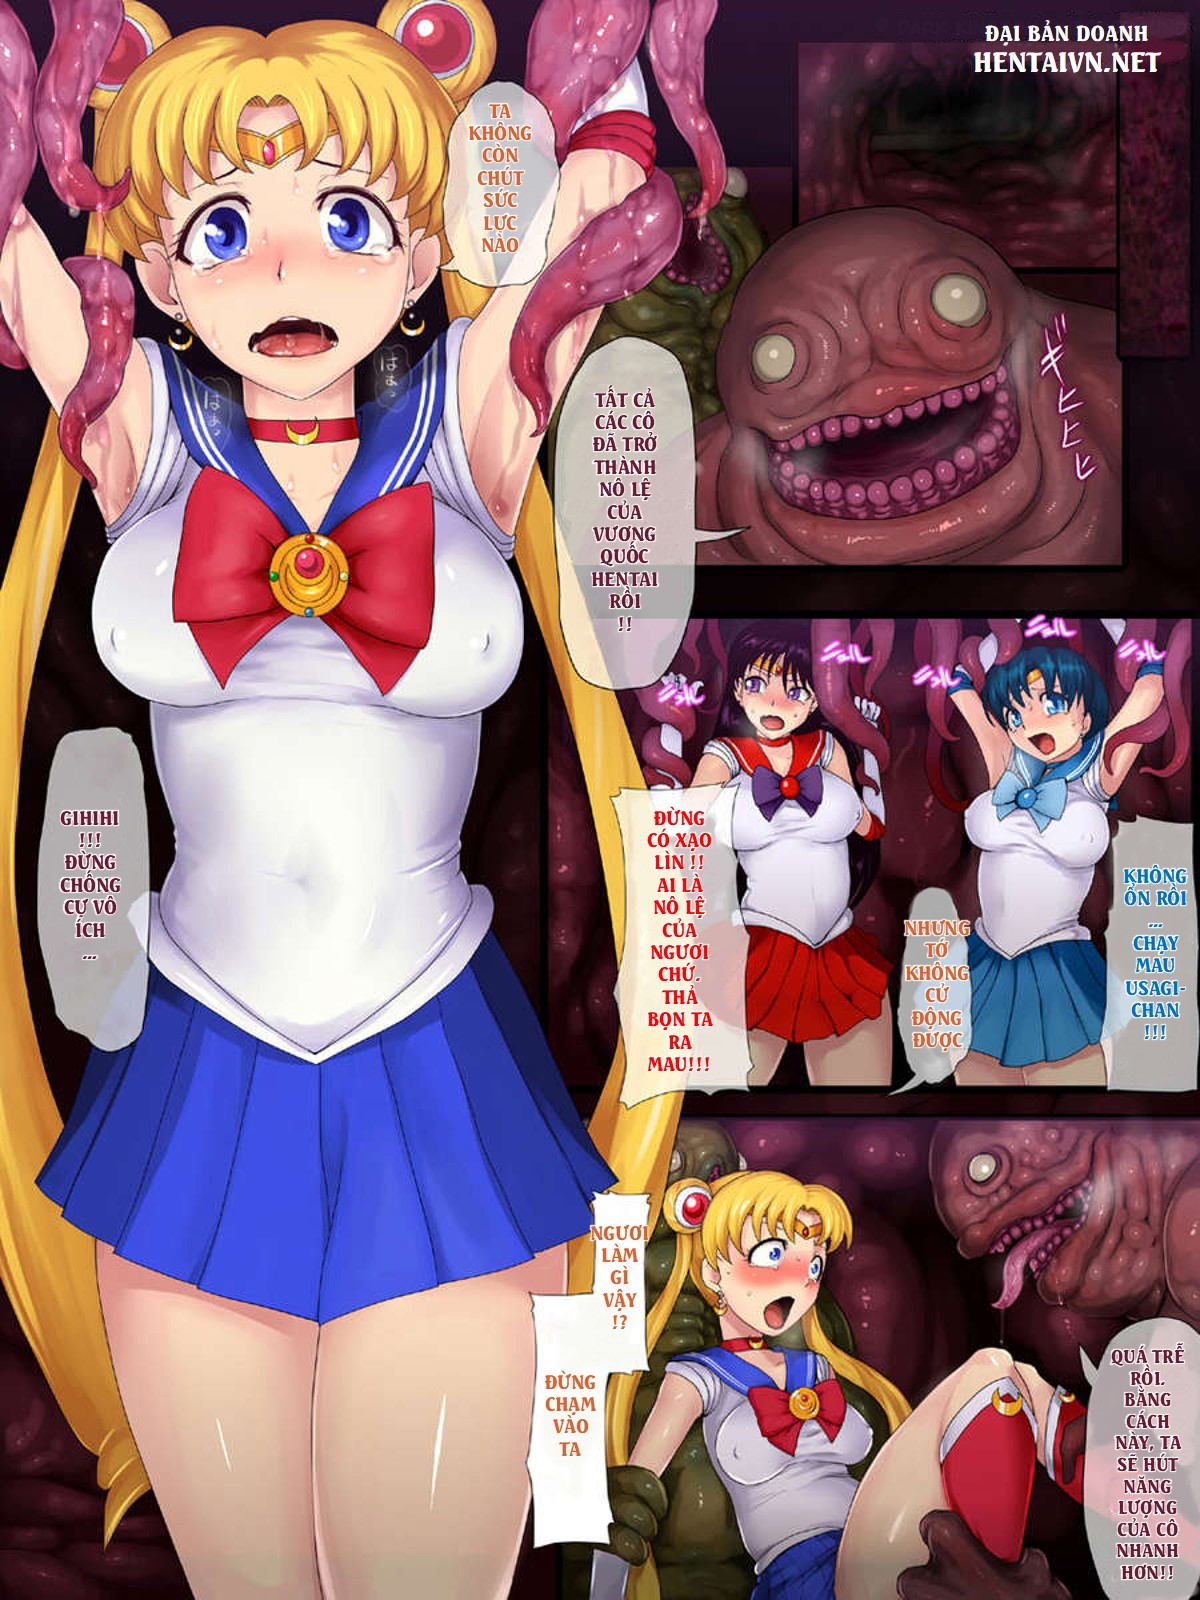 HentaiVN.net - Ảnh 2 - Sailor Senshi Ishu Kan Tettei Ryoujoku - セーラー戦士 異種姦徹底陵辱 - Oneshot